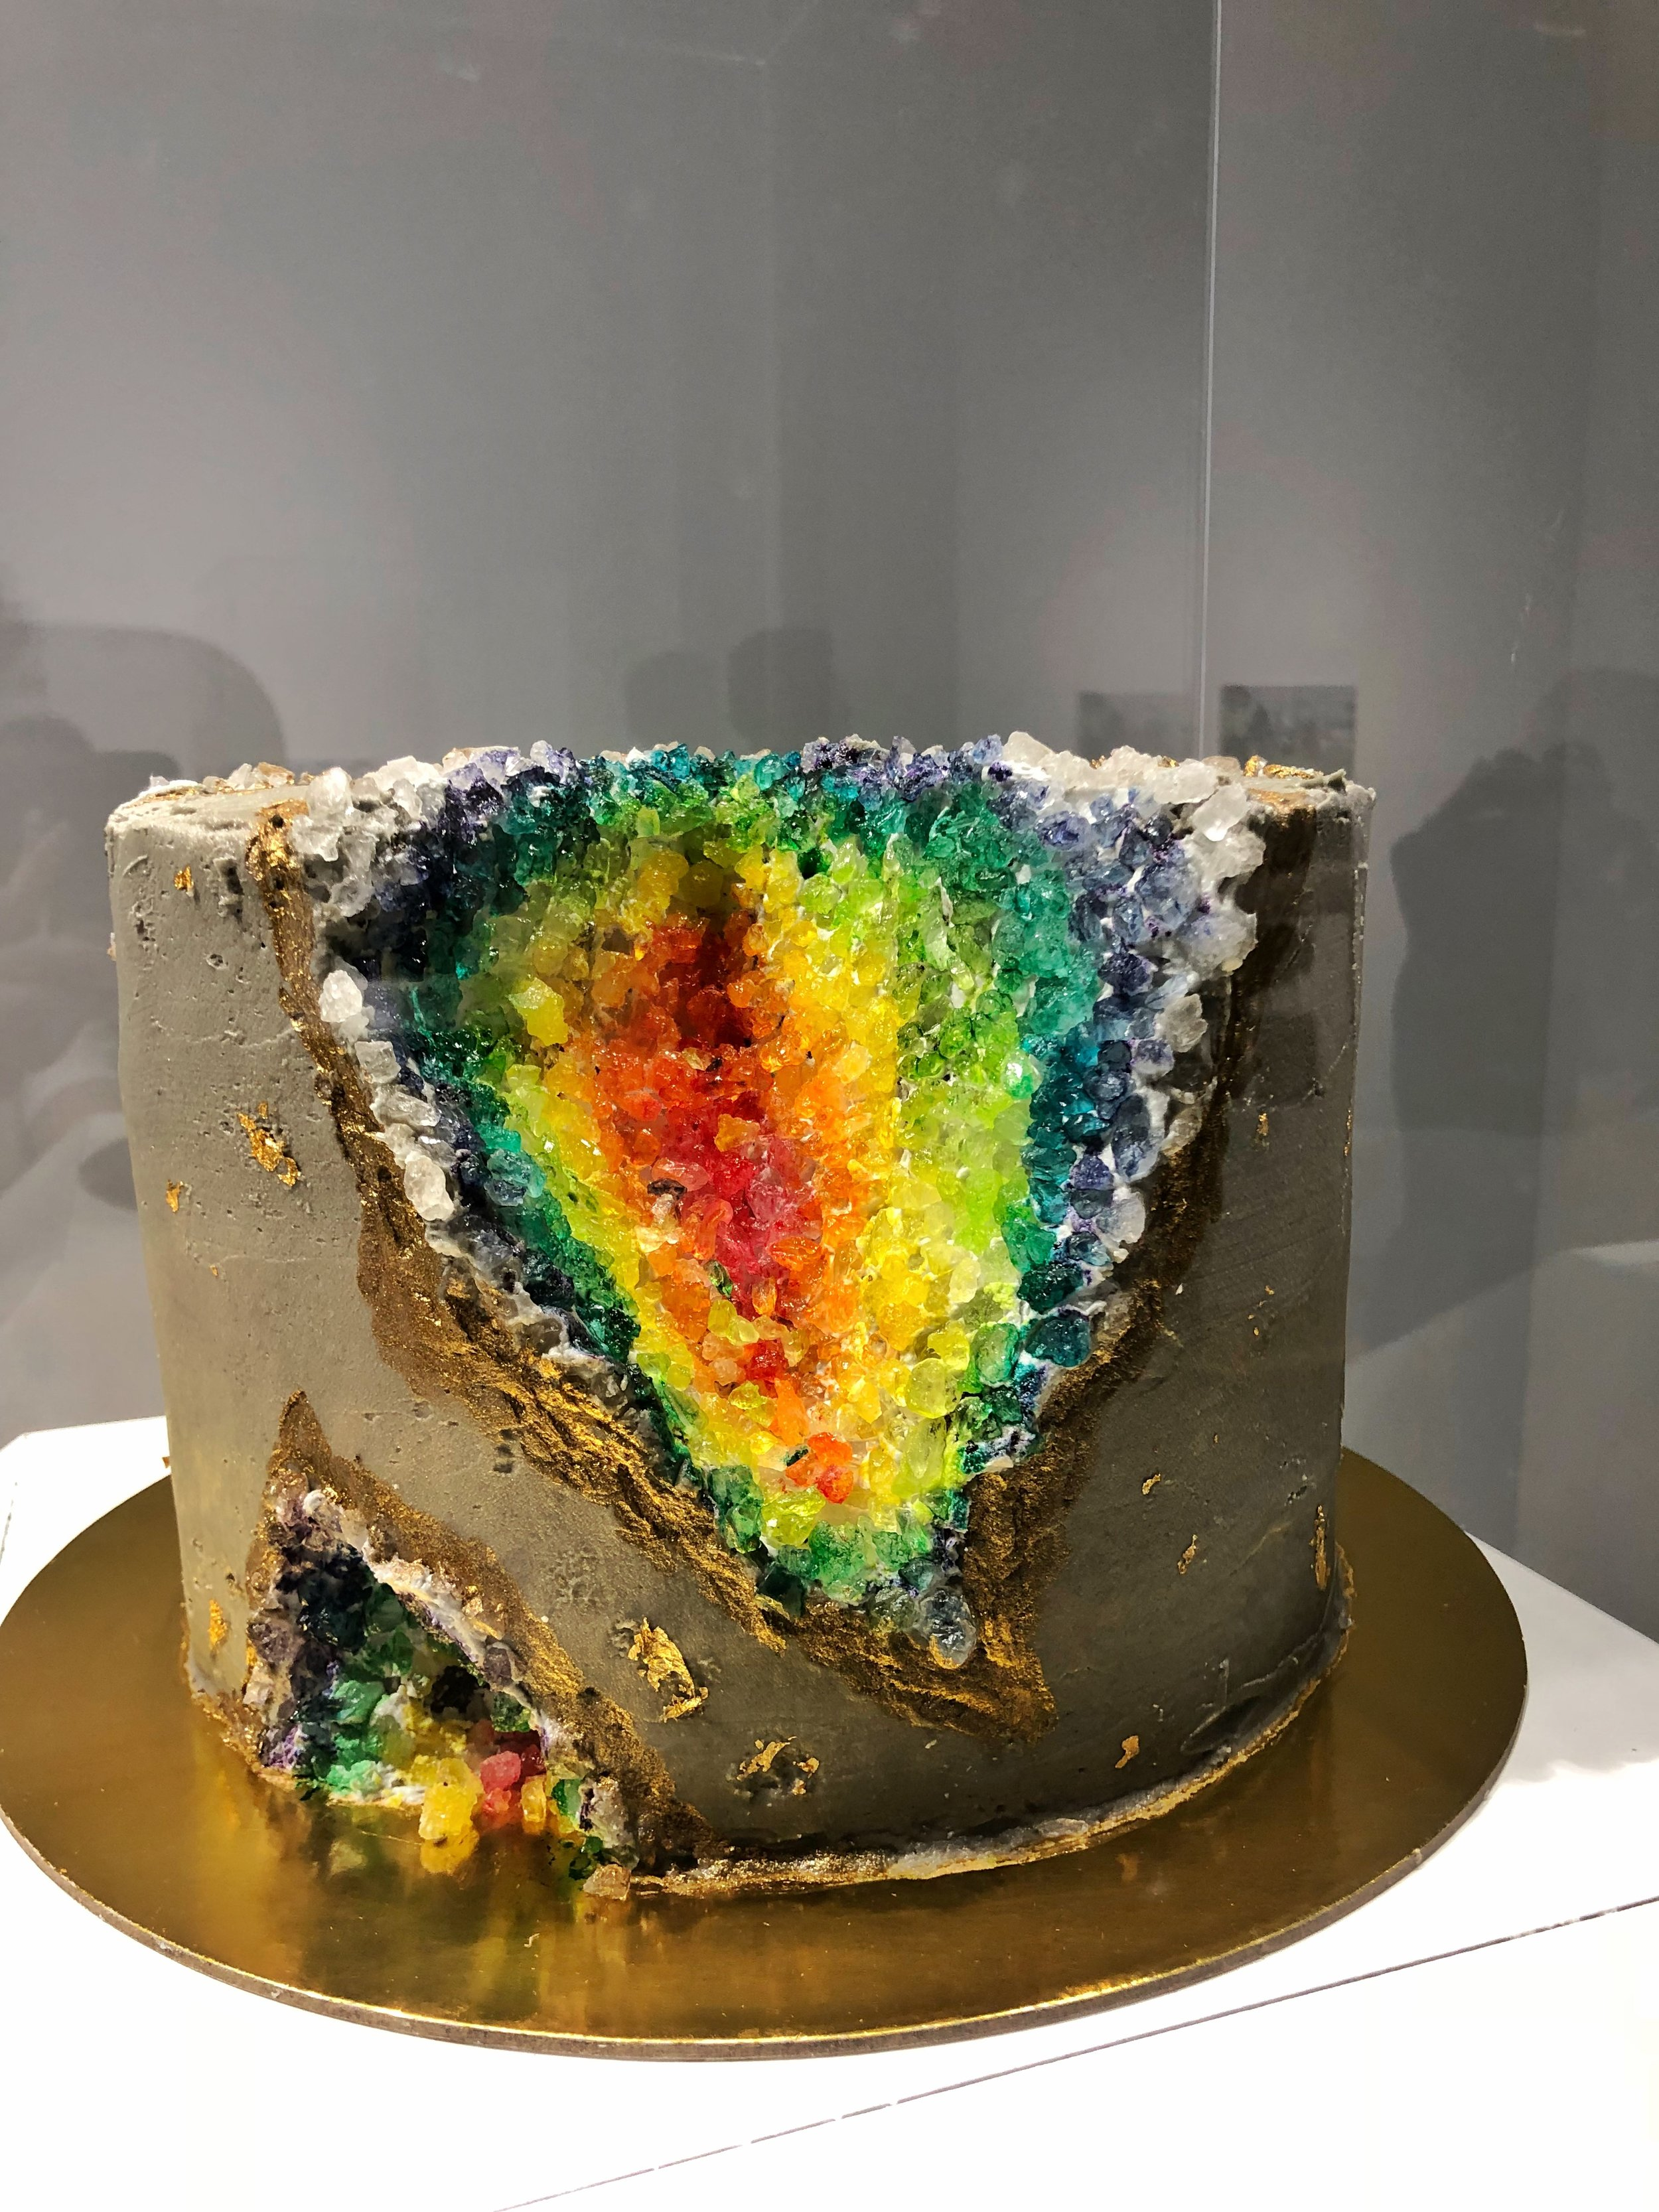 depressed-cake-shop- 6.jpg